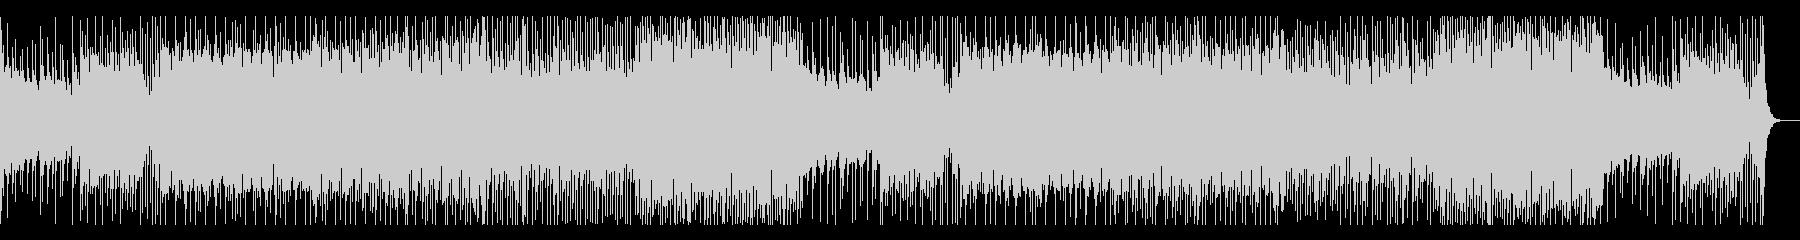 KARATEの未再生の波形